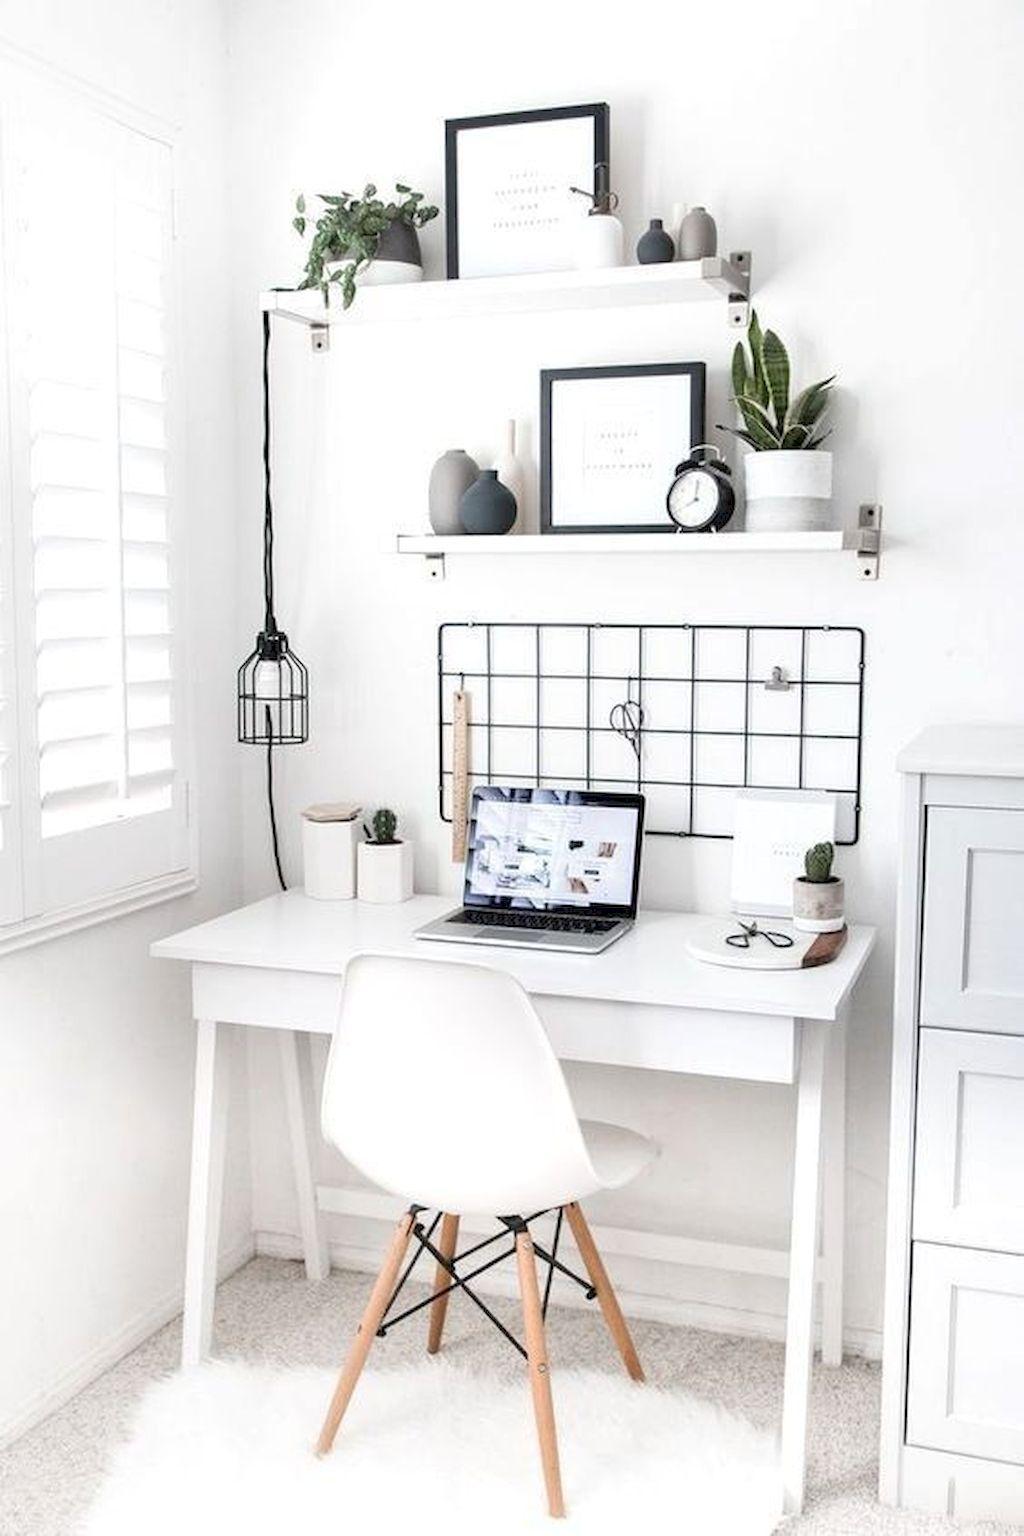 75 Beautiful Minimalist Home Decor Ideas - decorationroom